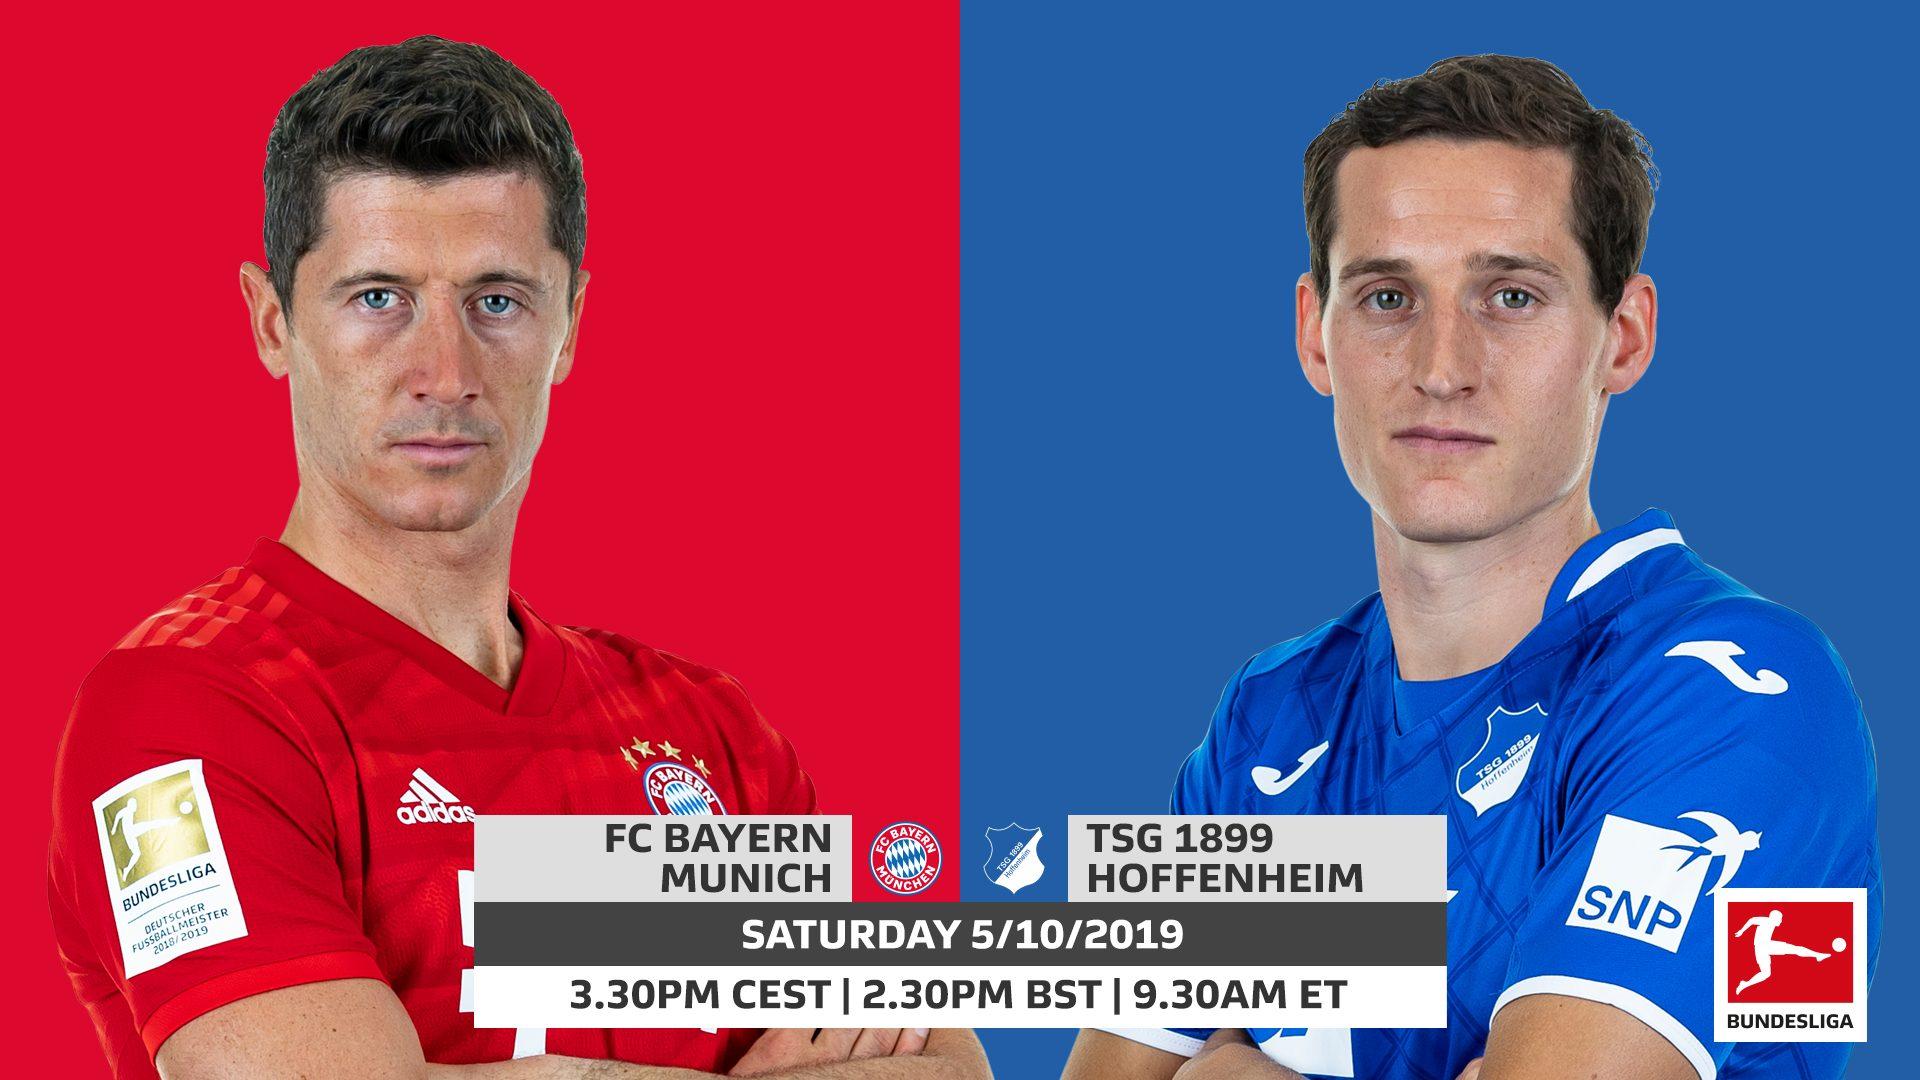 Abpfiff Bayern 1 2 Hoffenheim Wie Das War Tribuna Com